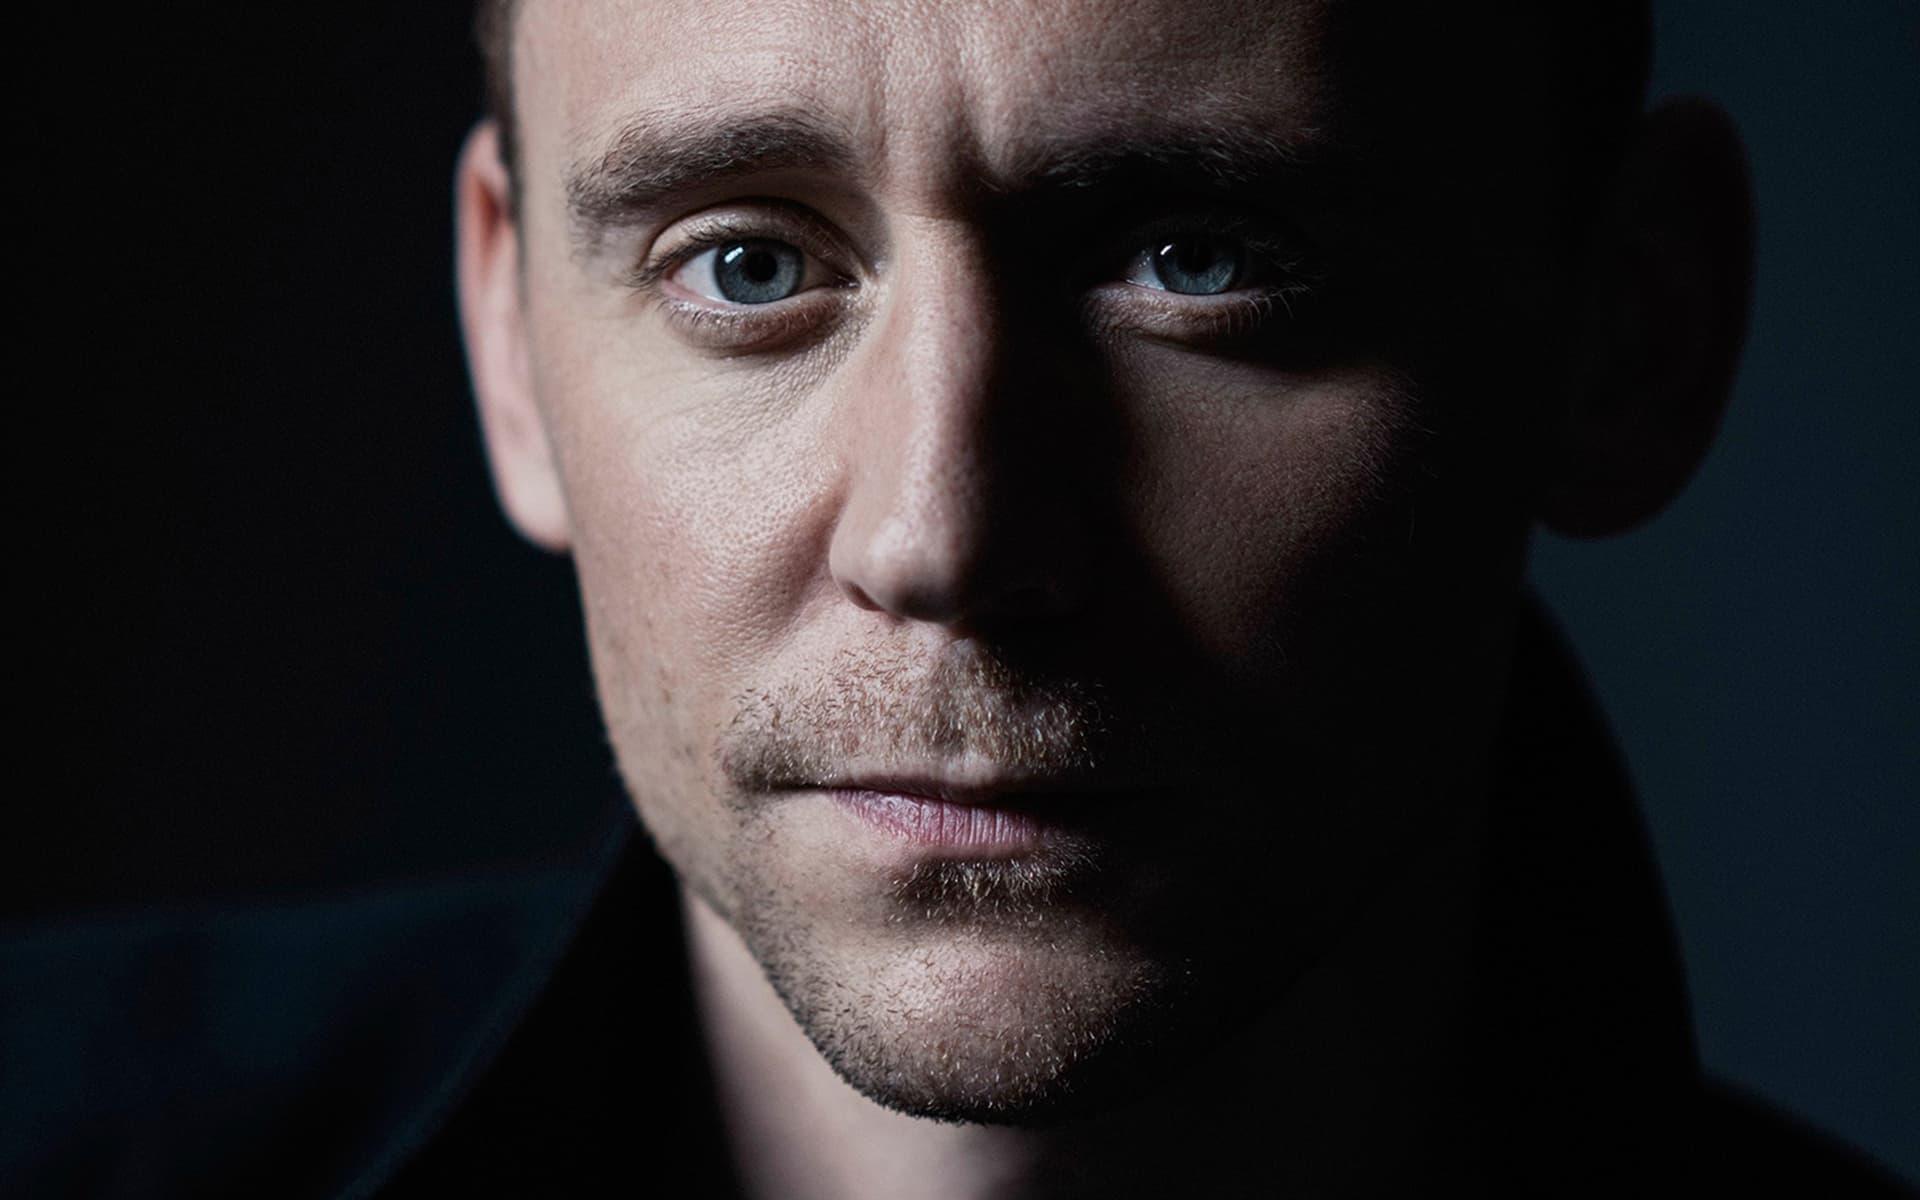 tom hiddleston face hd wallpaper 55675